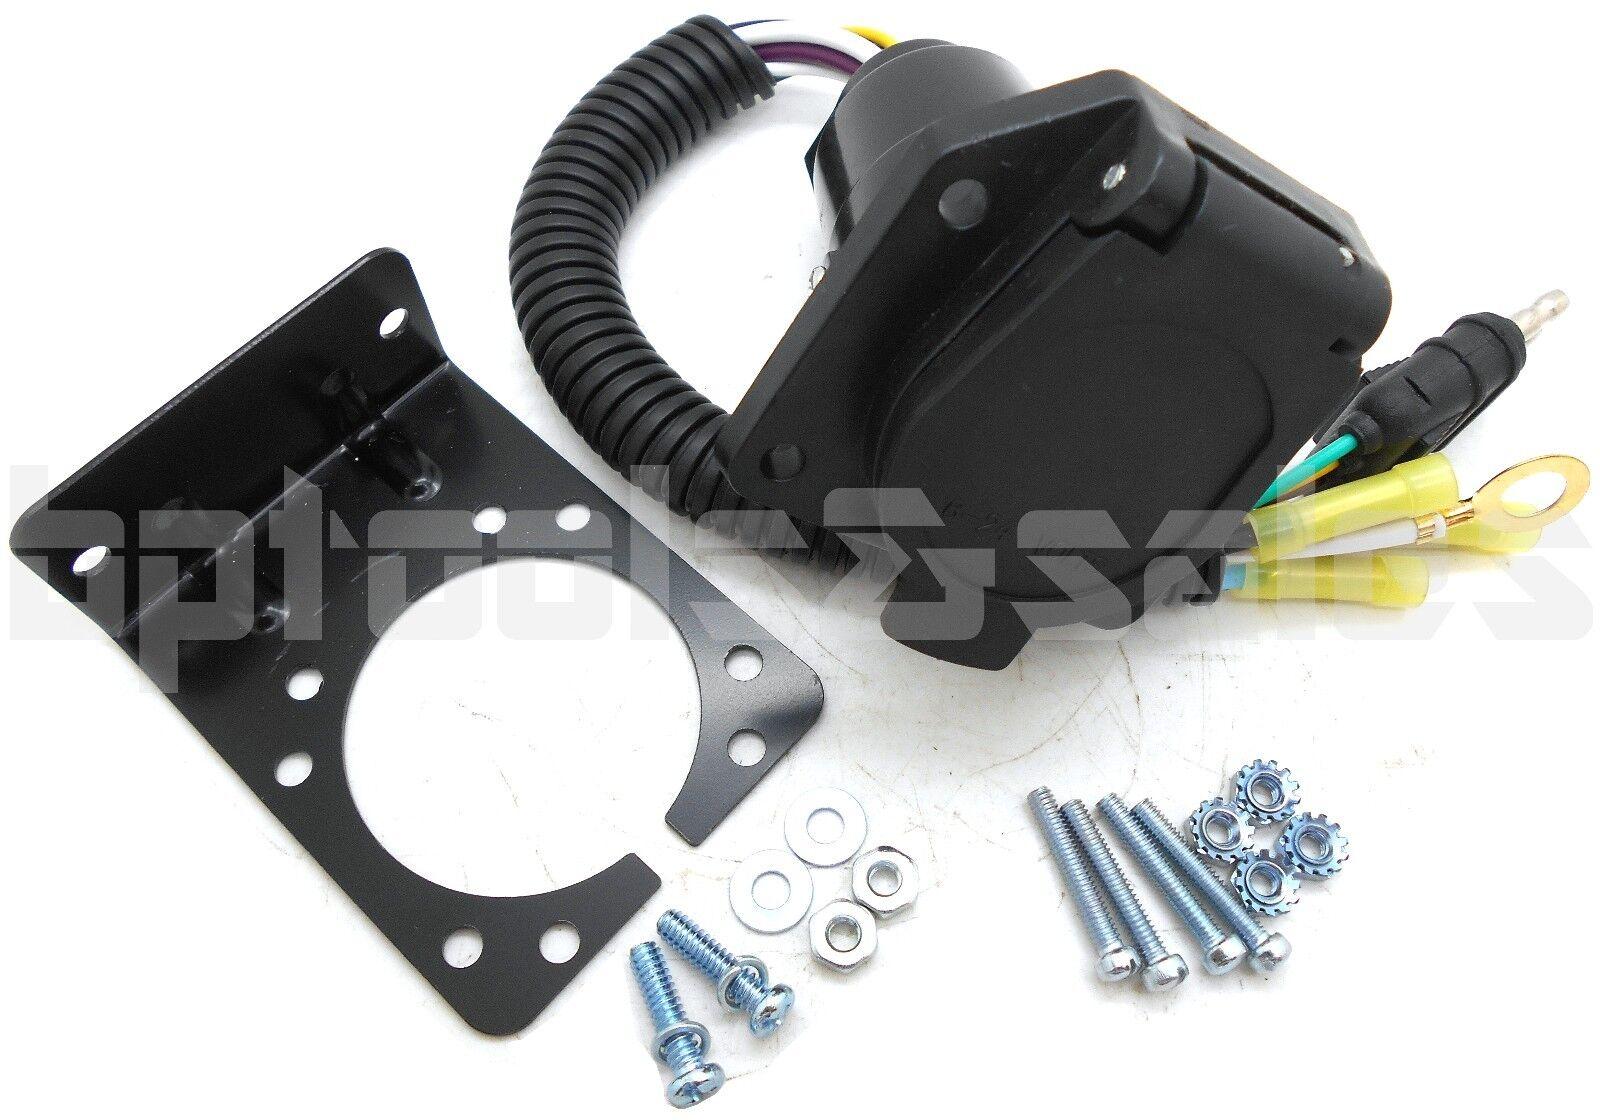 4 Wire Flat To 7 Way Rv Trailer Light Custom Plug Harness Wiring 5 Of Converter Adapter